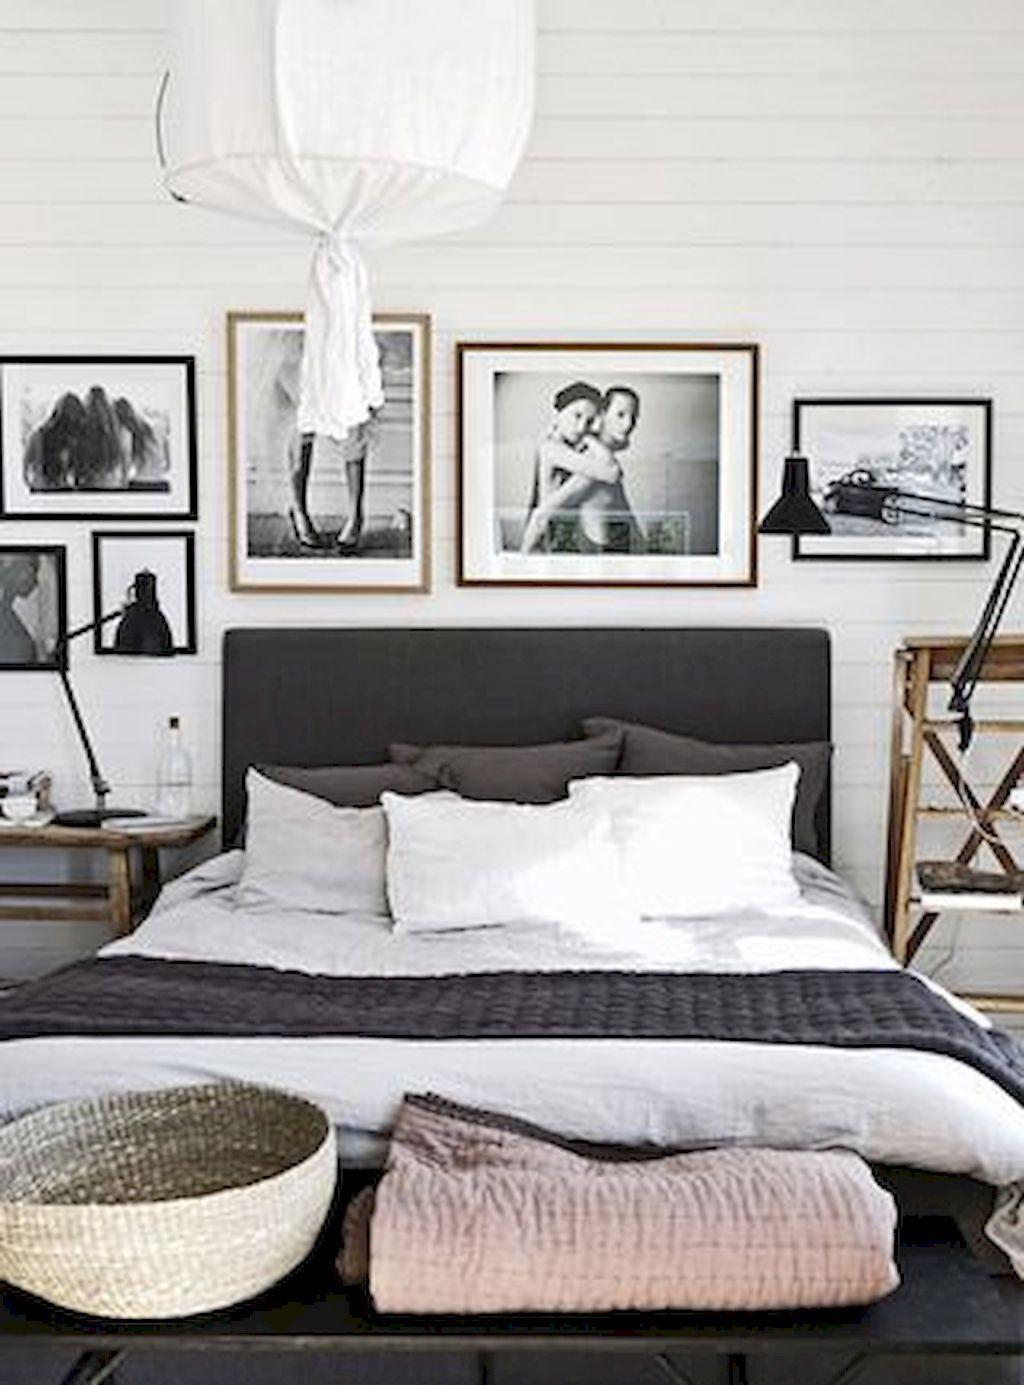 Master bedroom lighting  Fabulous master bedroom decorating ideas guest bedrooms small